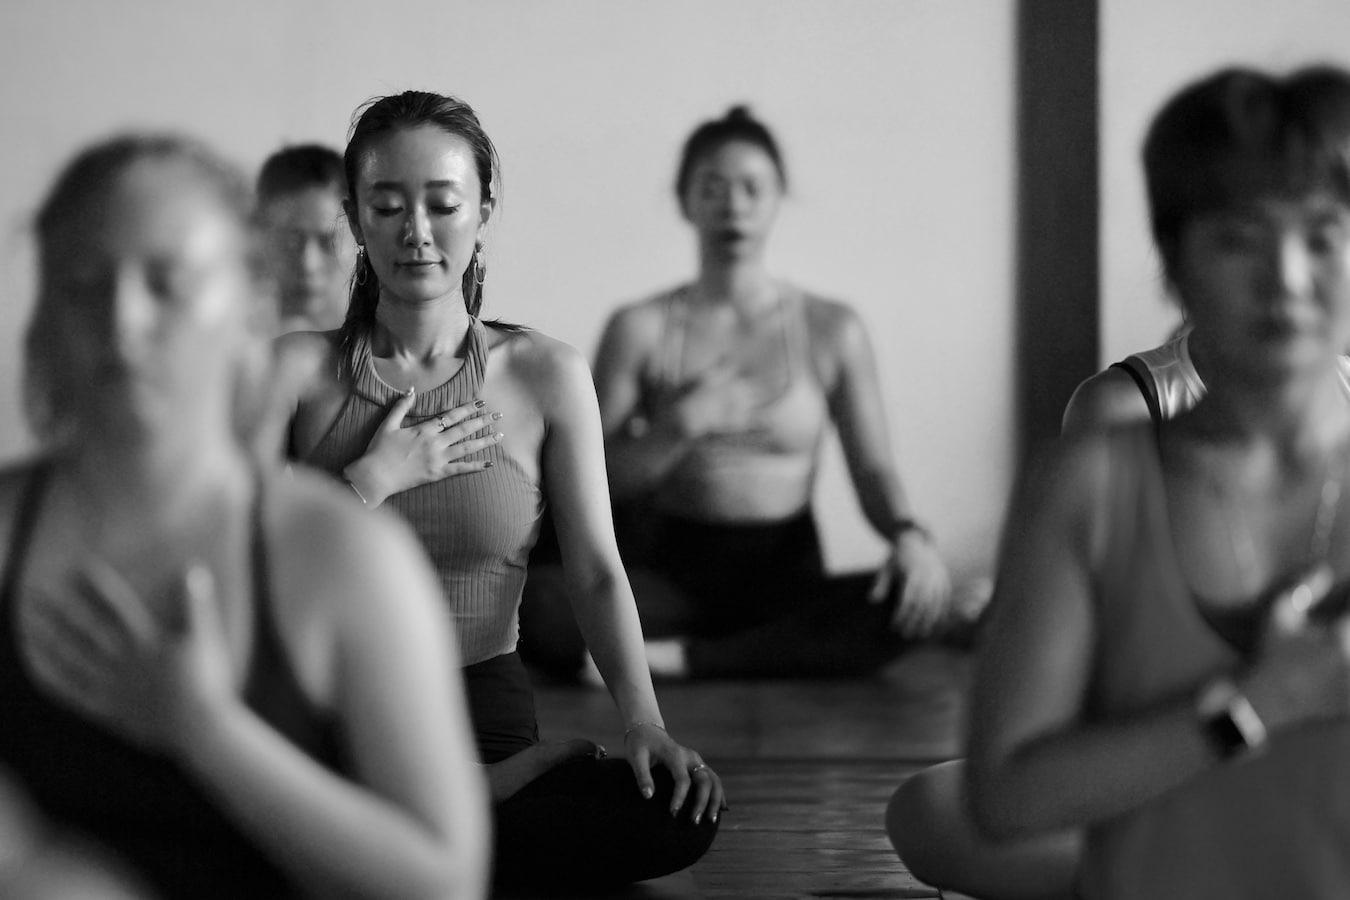 Yoga class sitting cross-legged with hand on heart